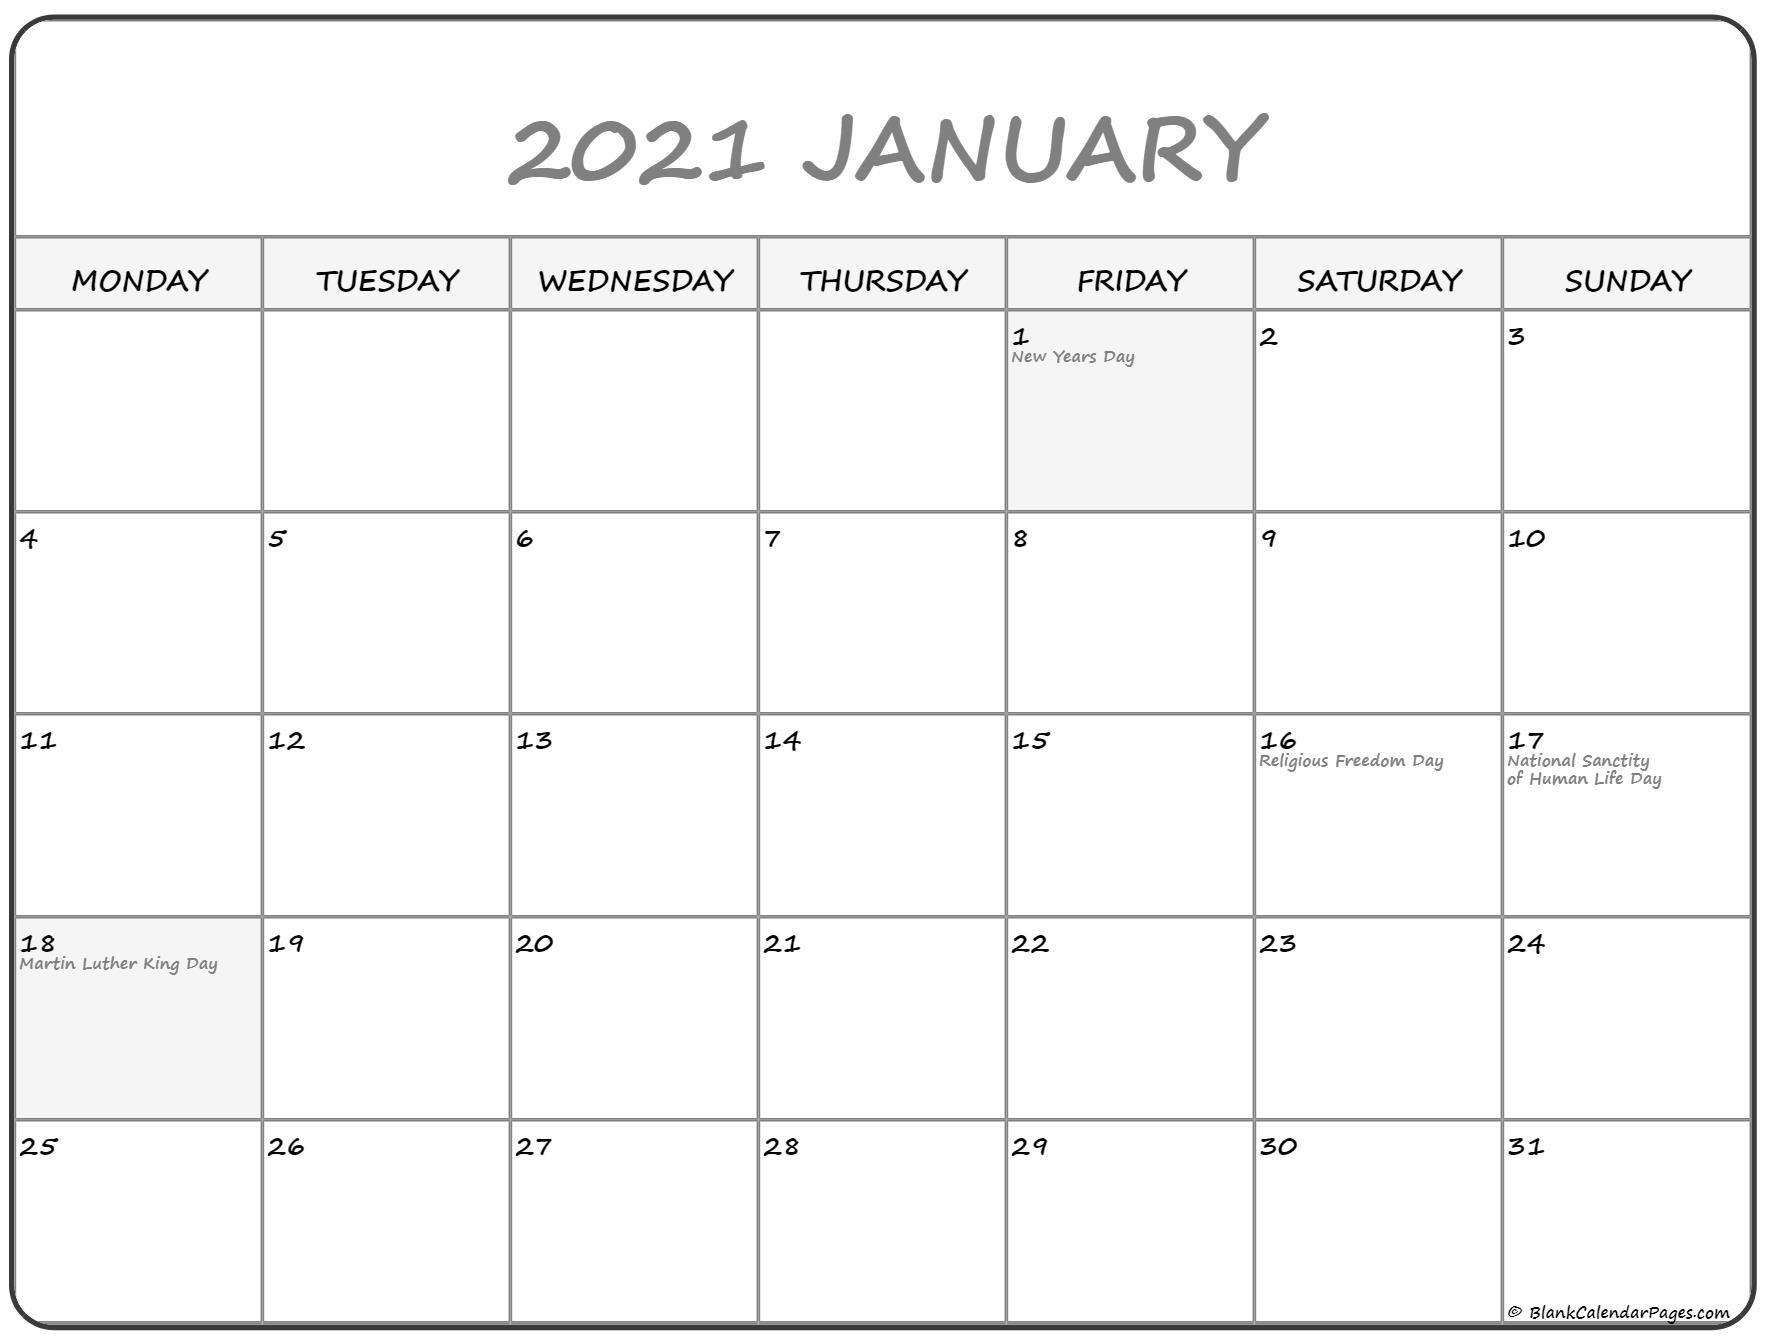 January 2021 Monday Calendar | Monday To Sunday-Sunday To Saturday Calendar 2021 Printable